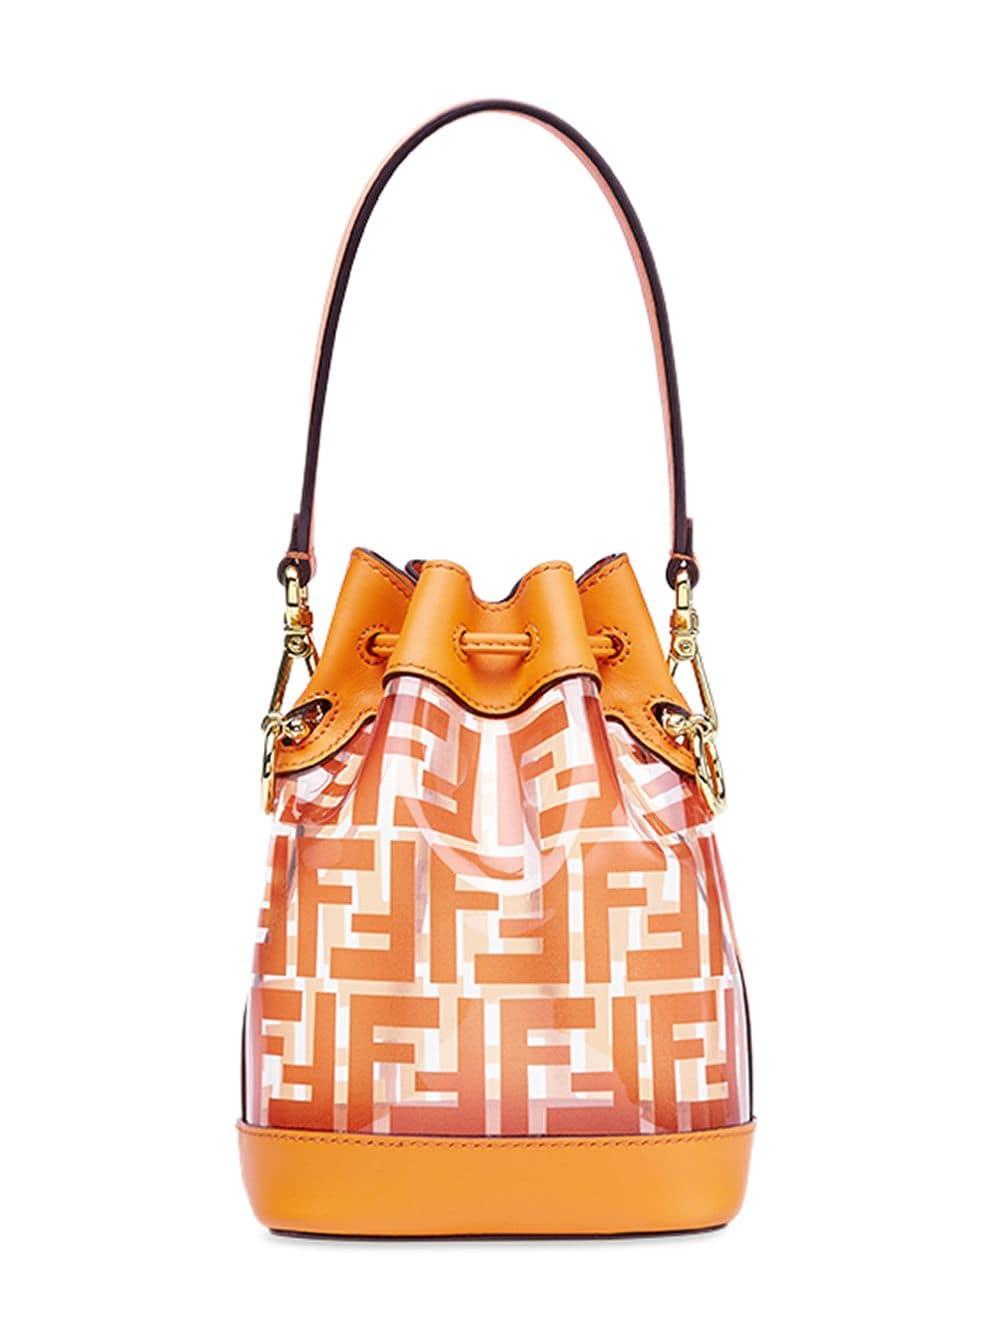 98880a8680ed Lyst - Fendi Mon Tresor Mini Bucket Bag in Orange